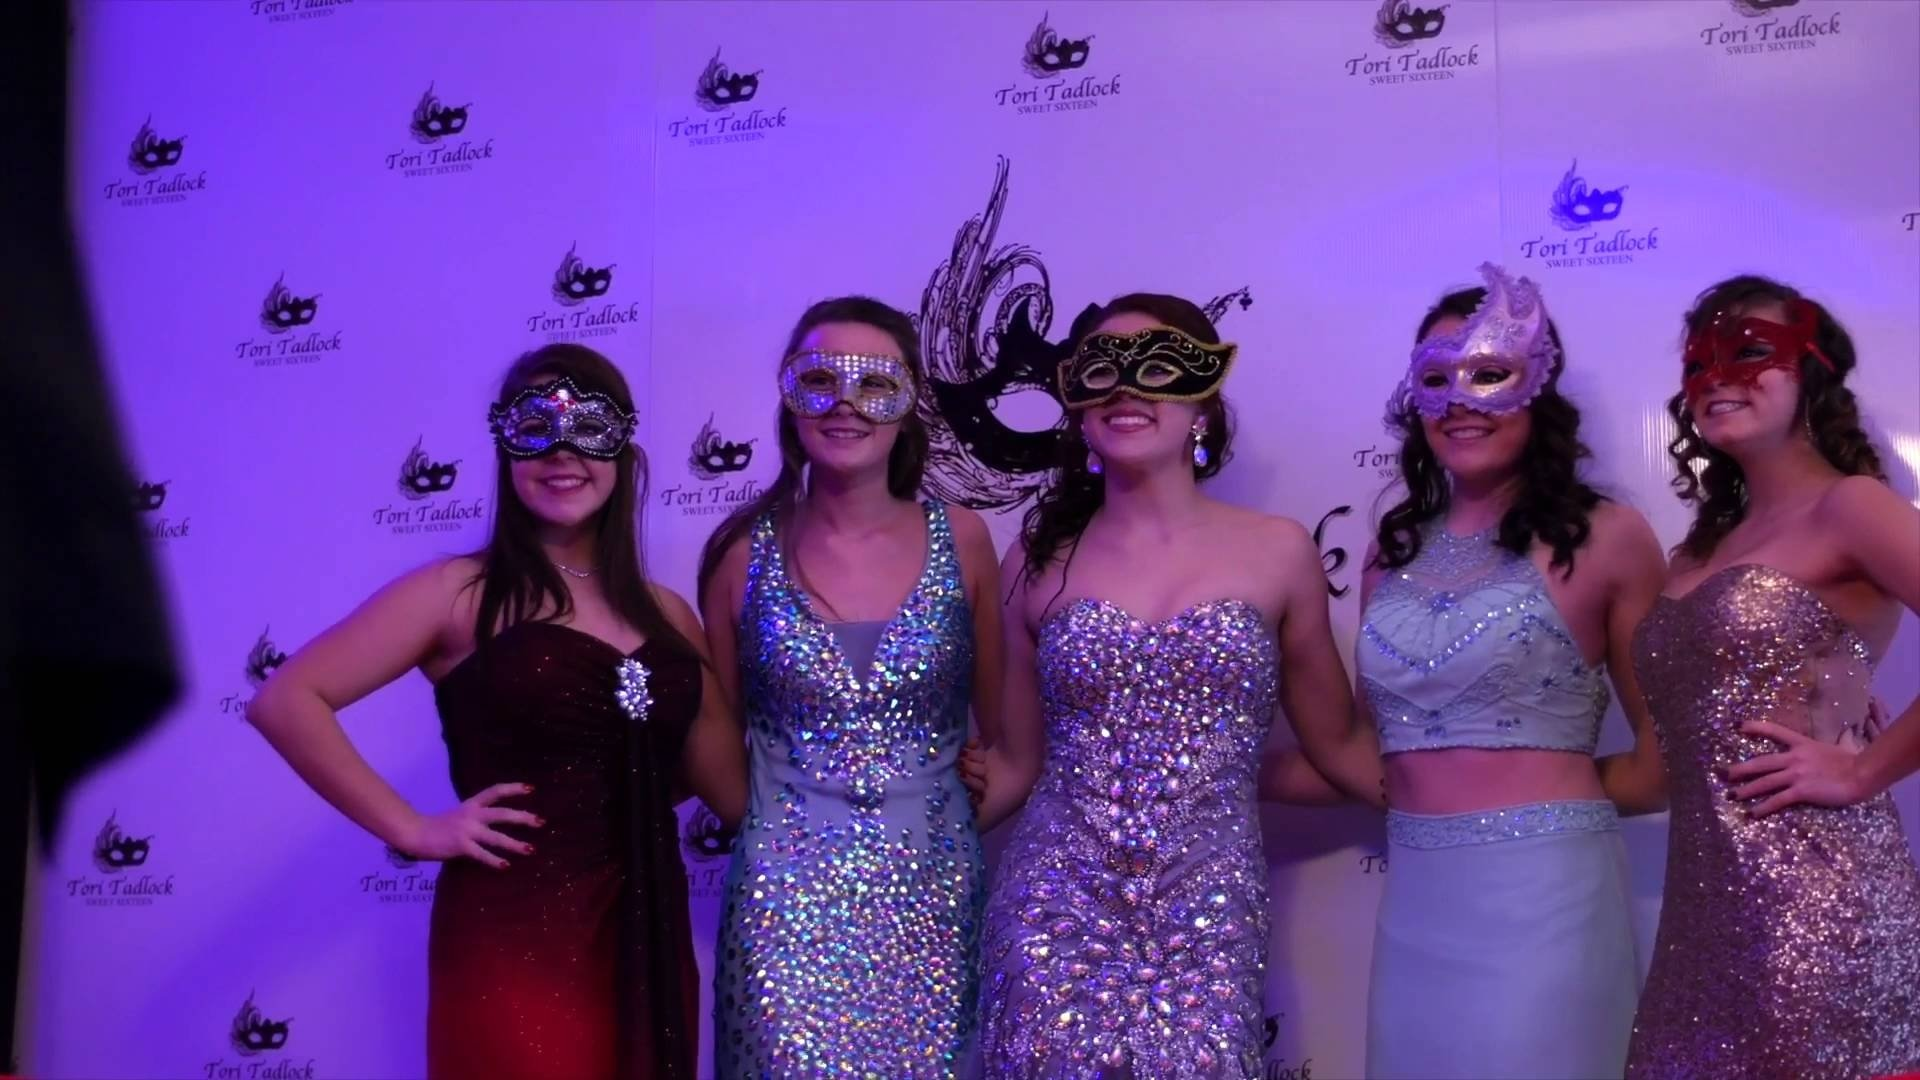 10 Elegant Masquerade Party Ideas Sweet 16 my sweet 16 masquerade party youtube 1 2020